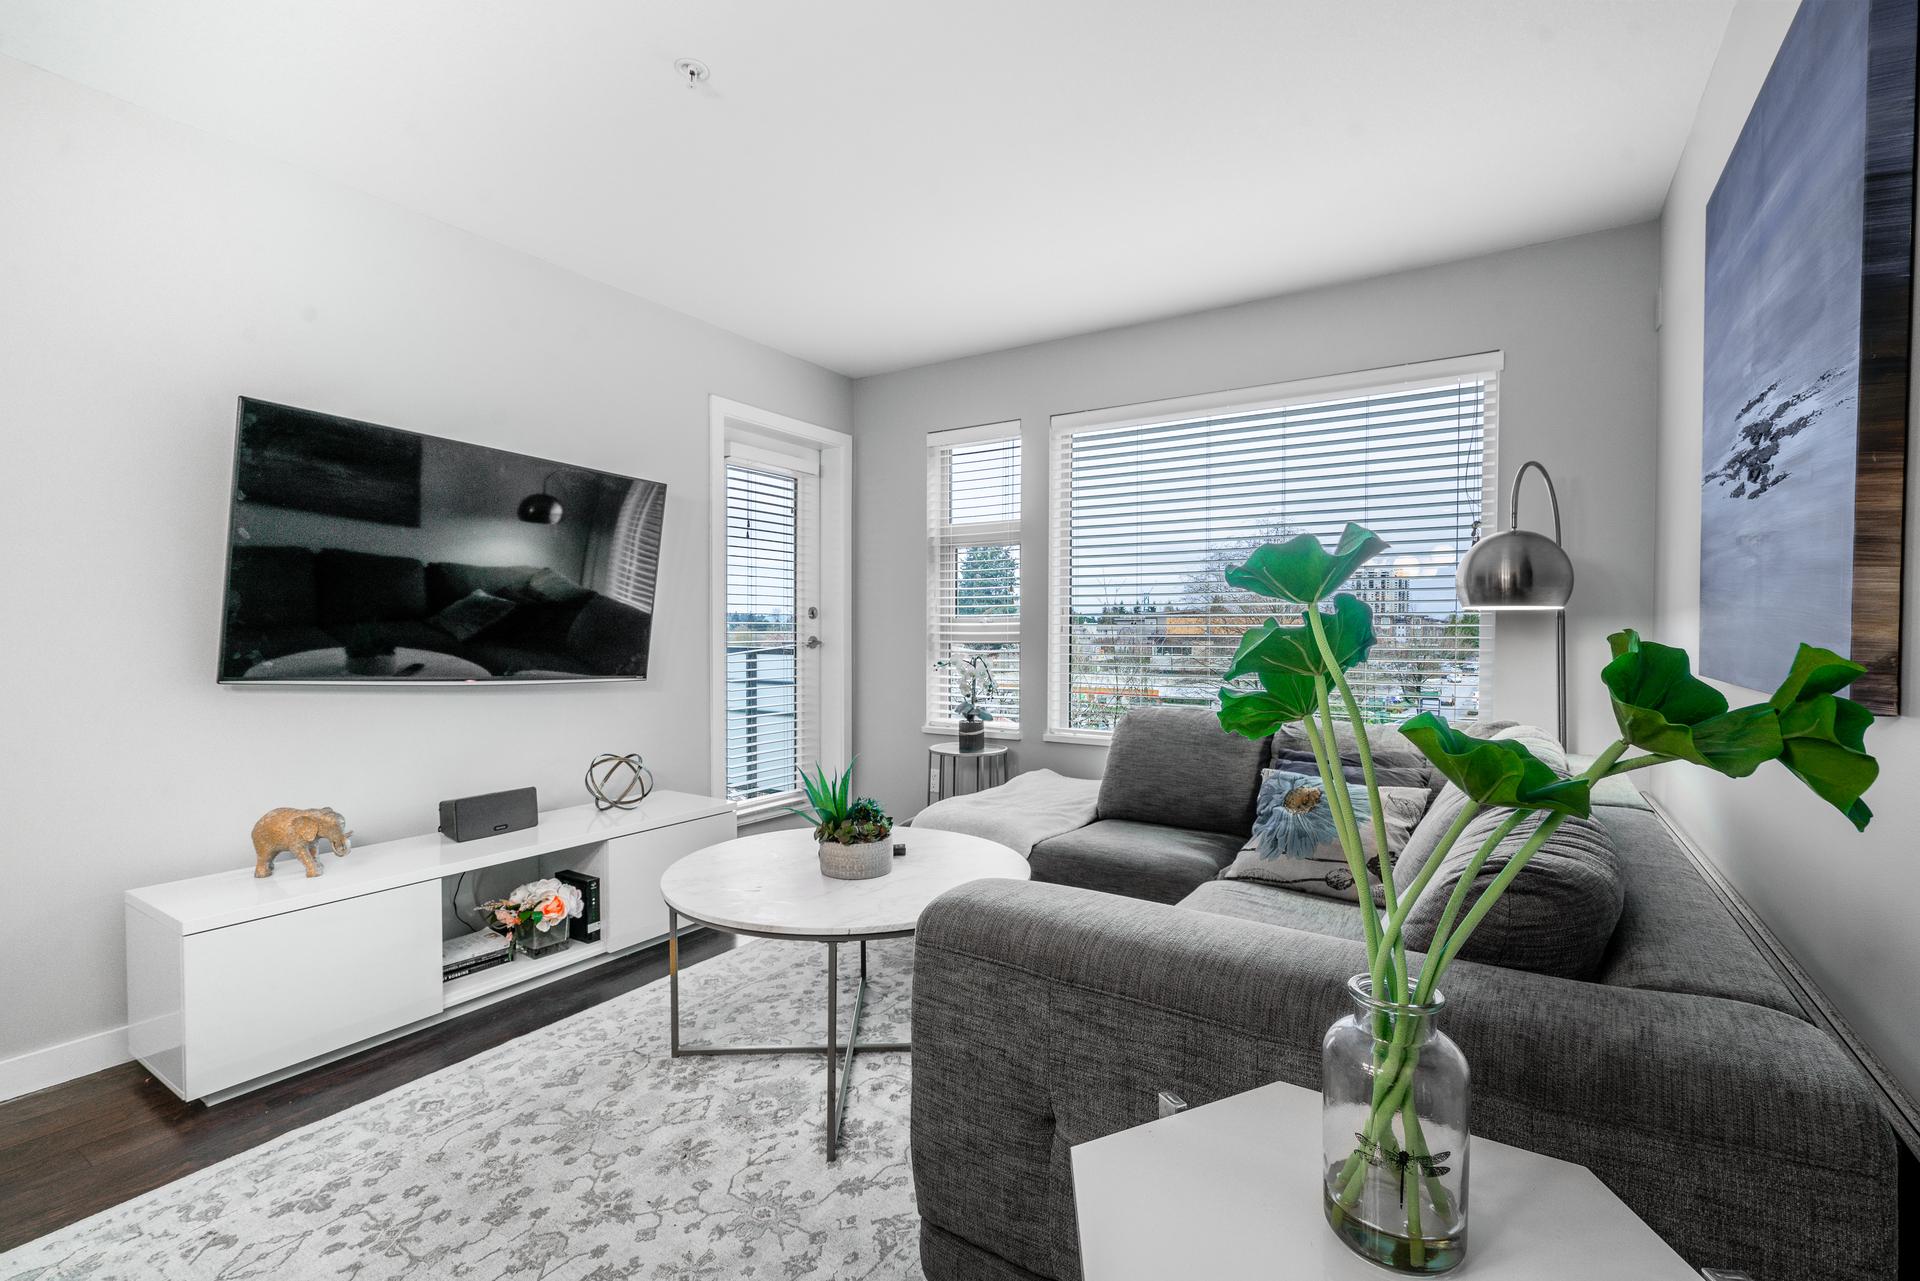 unit-410-1677-lloyd-avenue-north-vancouver-10 at 410 - 1677 Lloyd Avenue, Pemberton NV, North Vancouver